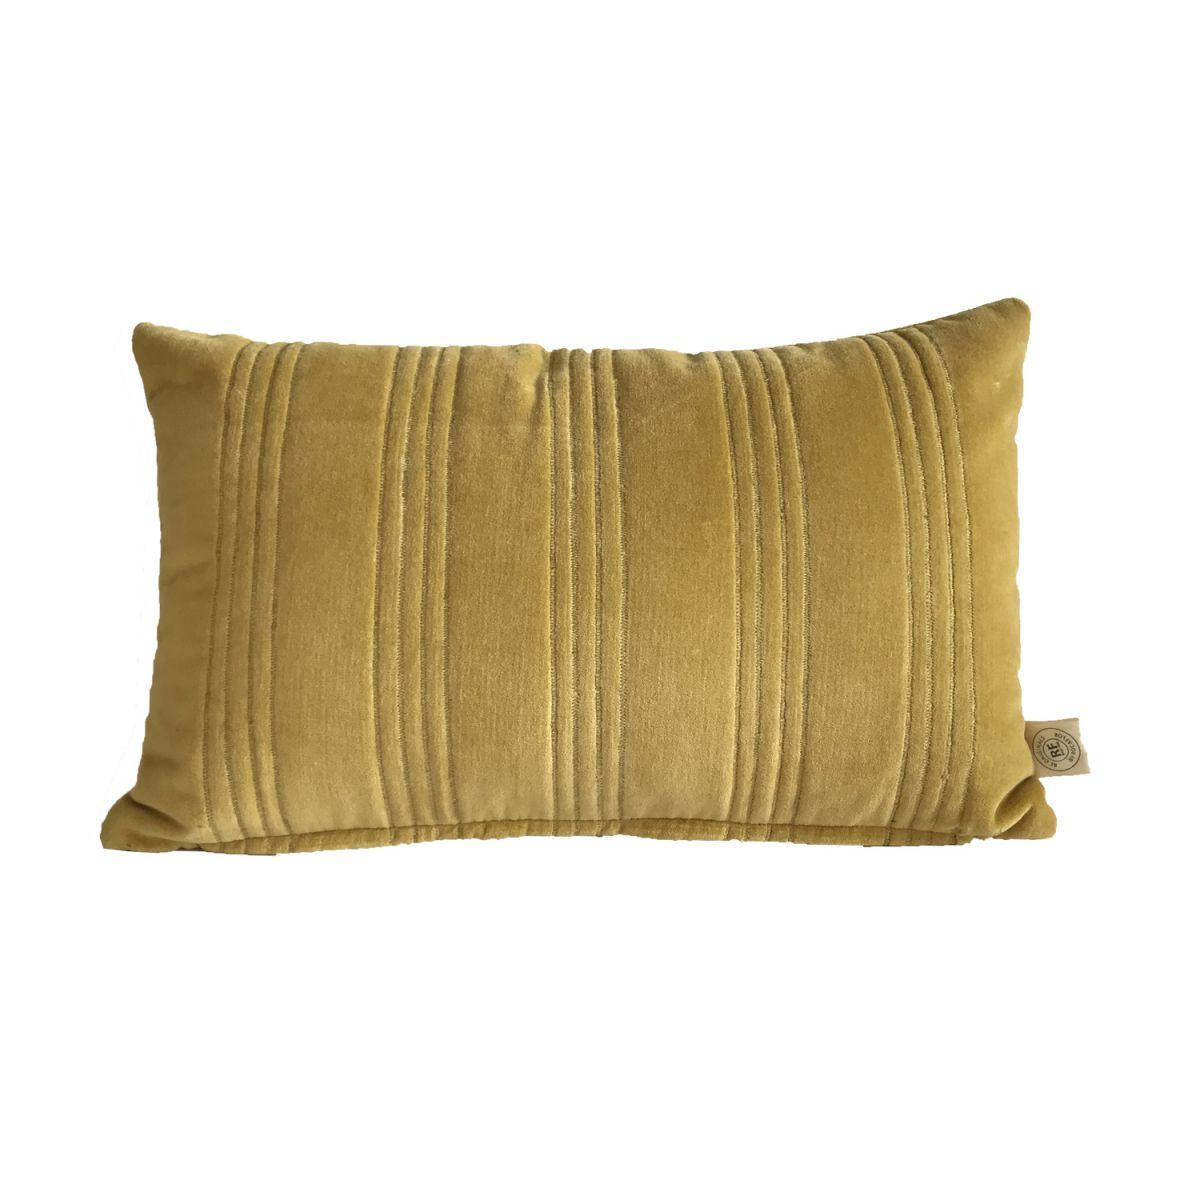 kussen velours oker met gouden stiksel 50x30cm